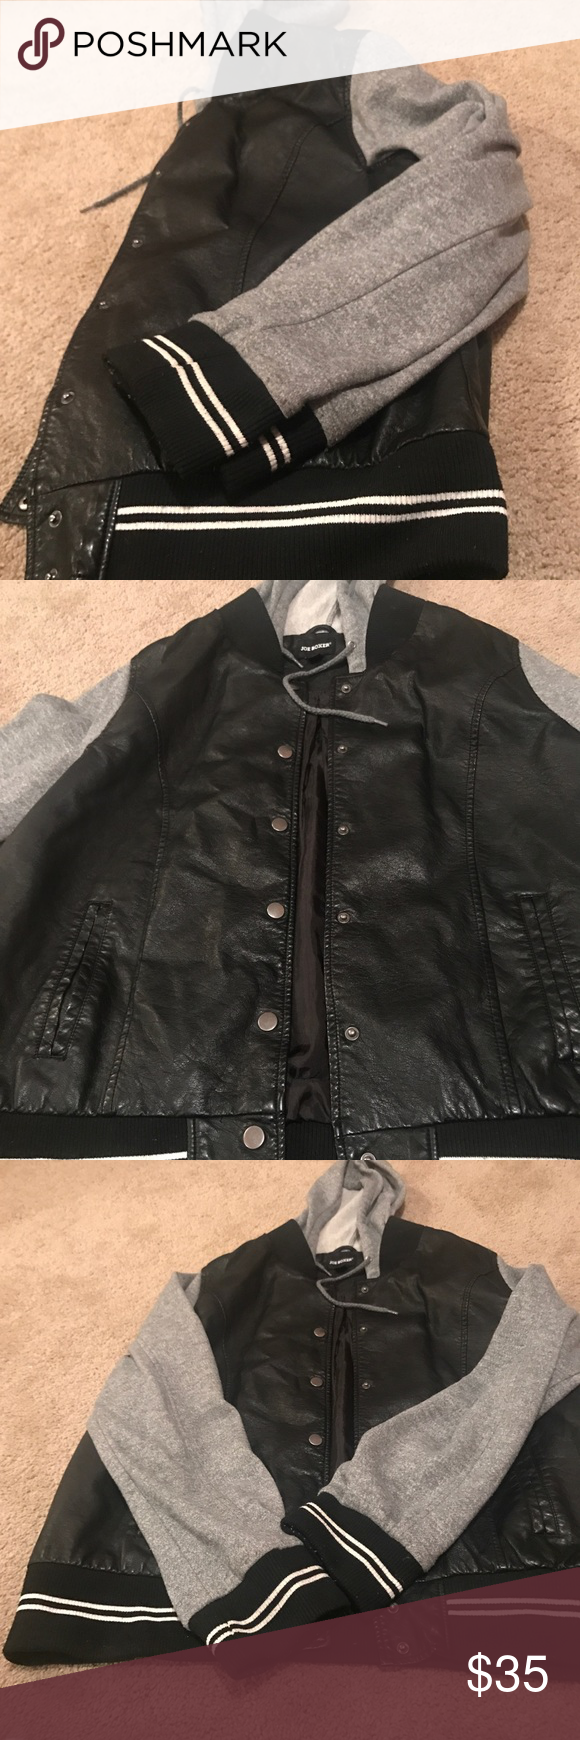 cae82f7cf7a5c Women's / Juniors Black and Gray Jacket XL Preowned Joe Boxer Women's  Jacket good condition Joe Boxer Jackets & Coats